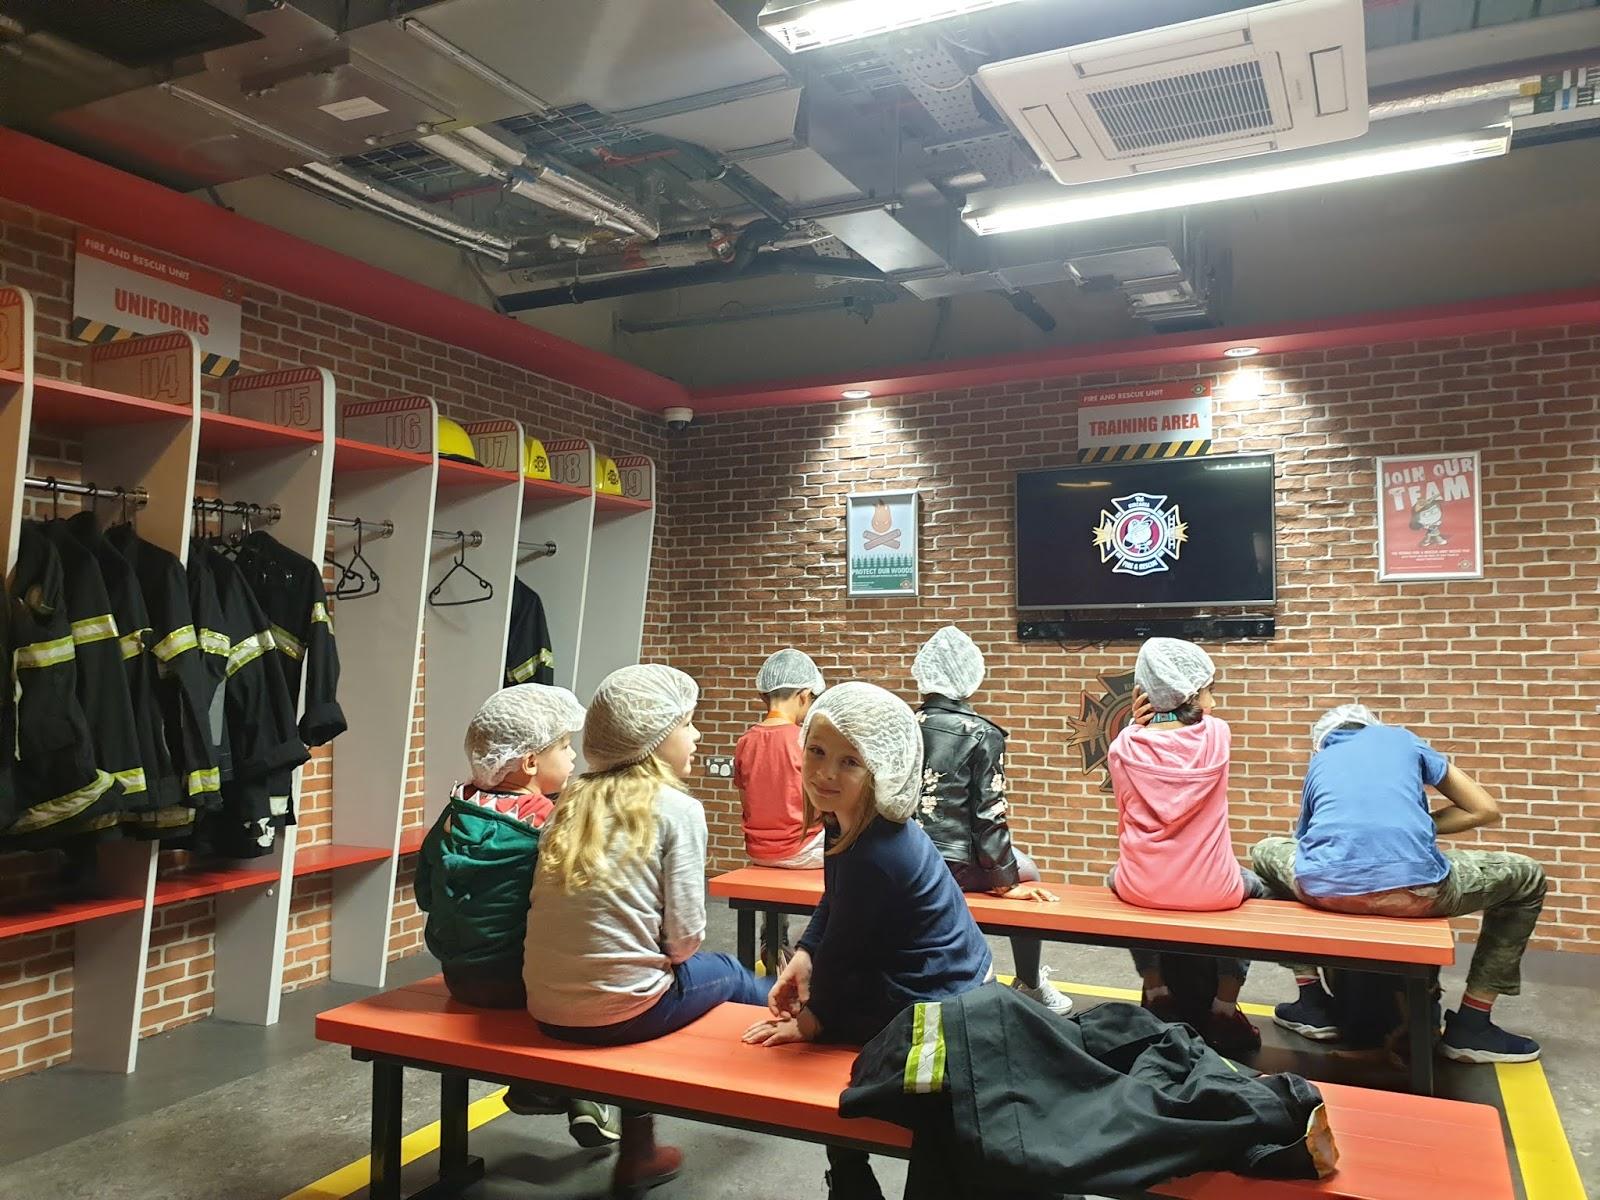 kidzania firefighter academy